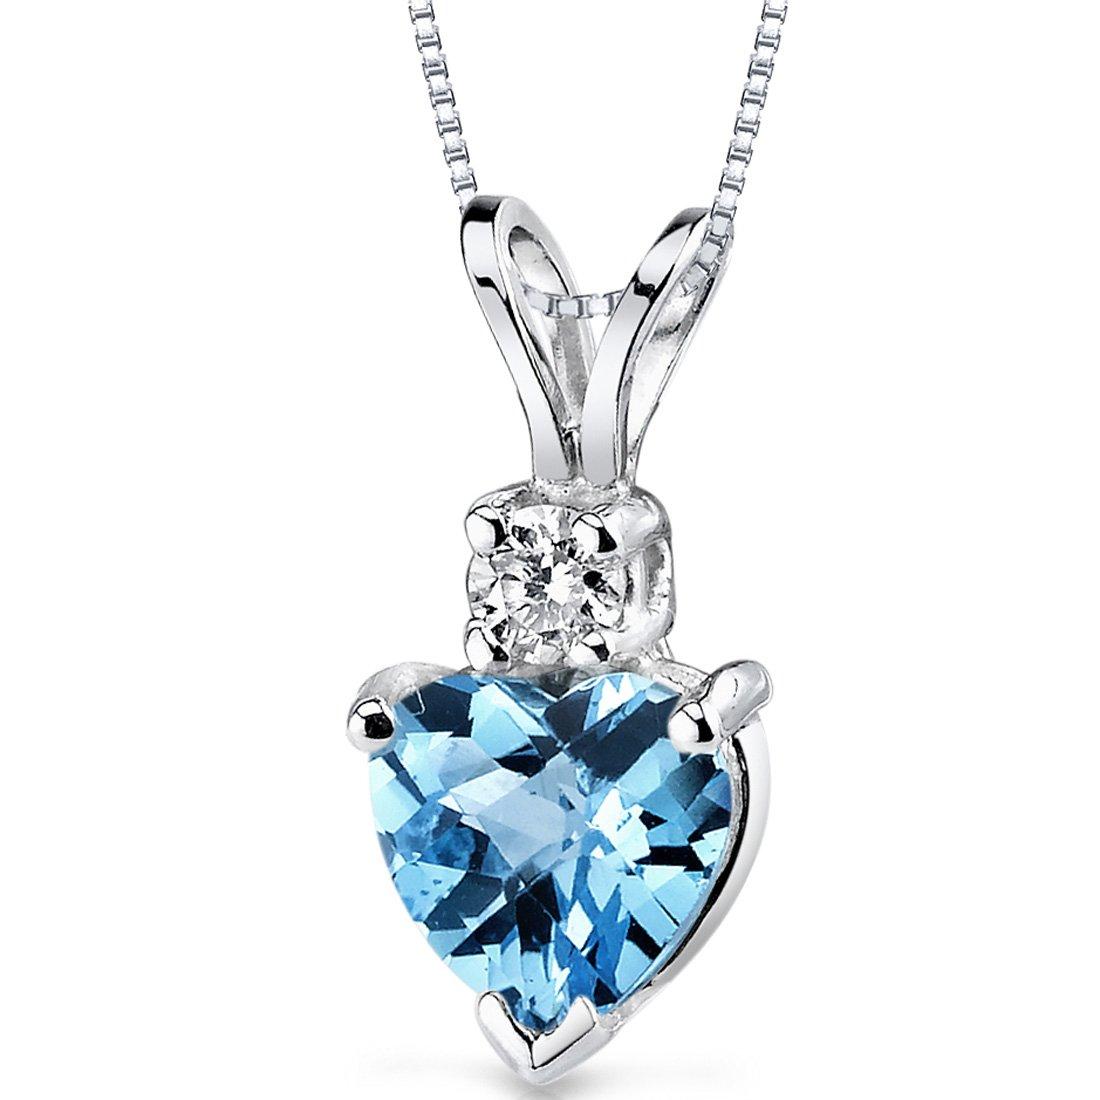 14 Karat White Gold Heart Shape 1.00 Carats Swiss Blue Topaz Diamond Pendant